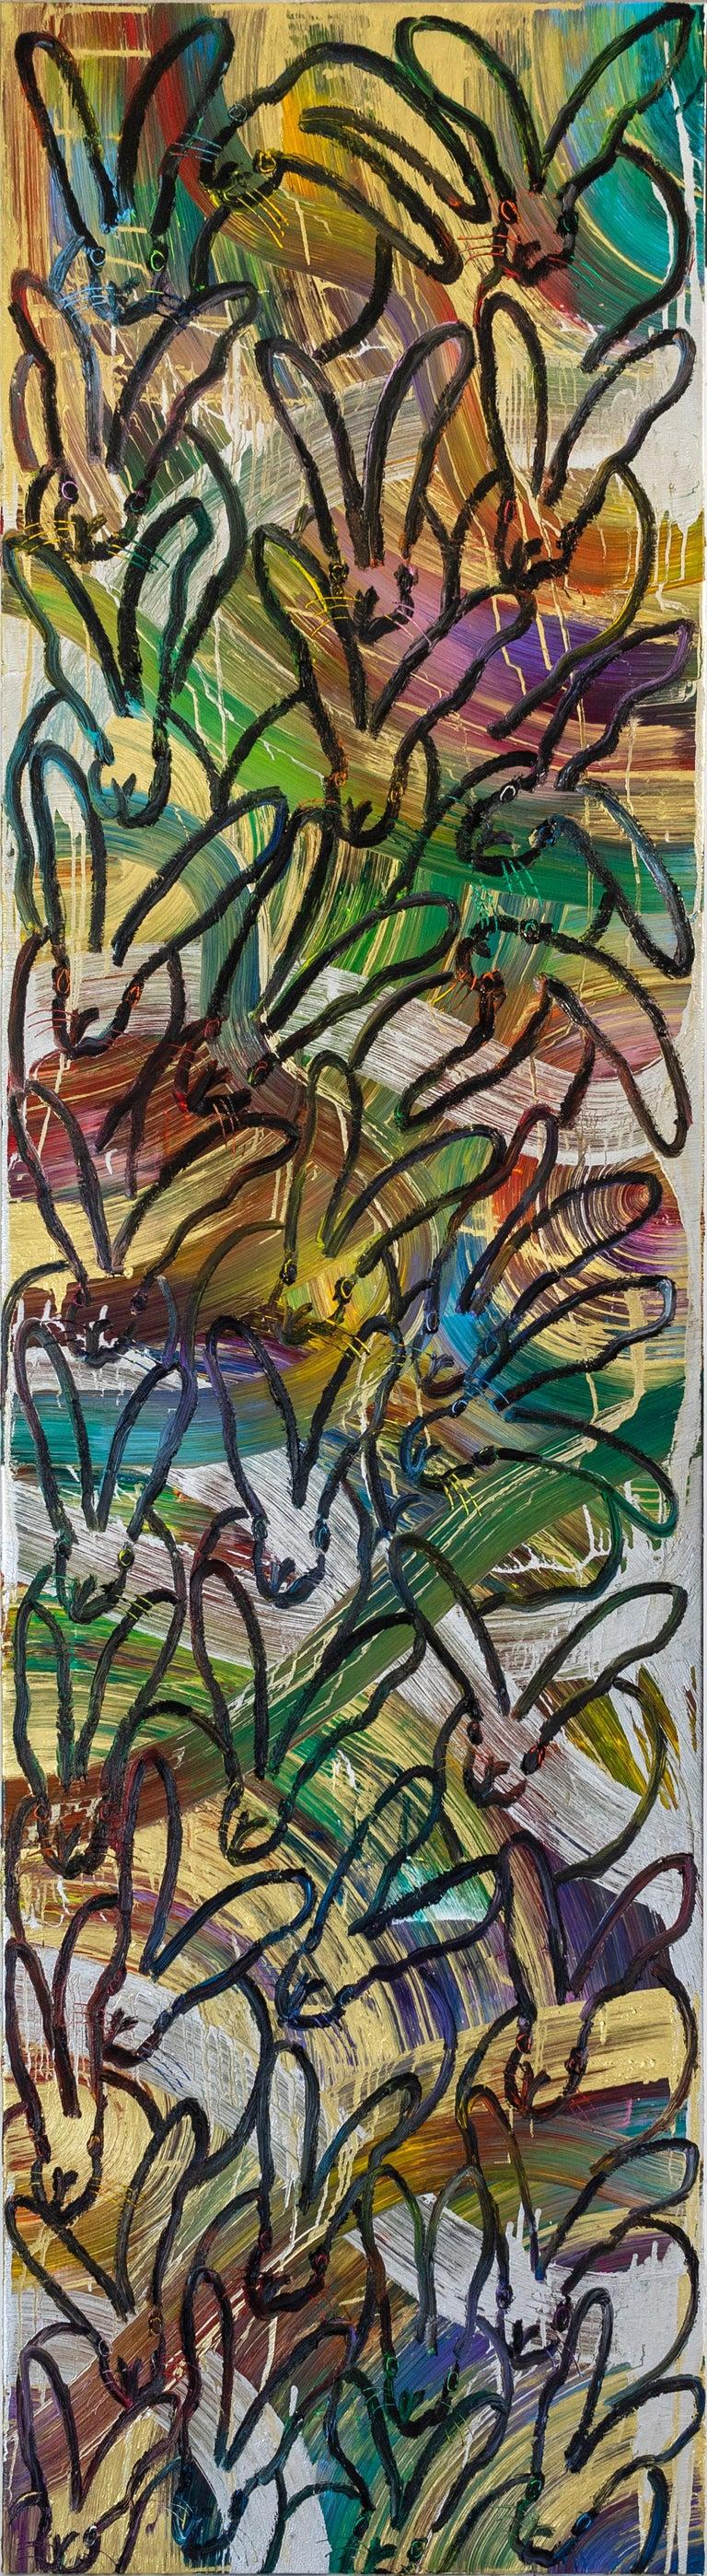 "Hunt Slonem ""Tall Totem"" Multicolored Rainbow Metallic Bunnies - Painting by Hunt Slonem"